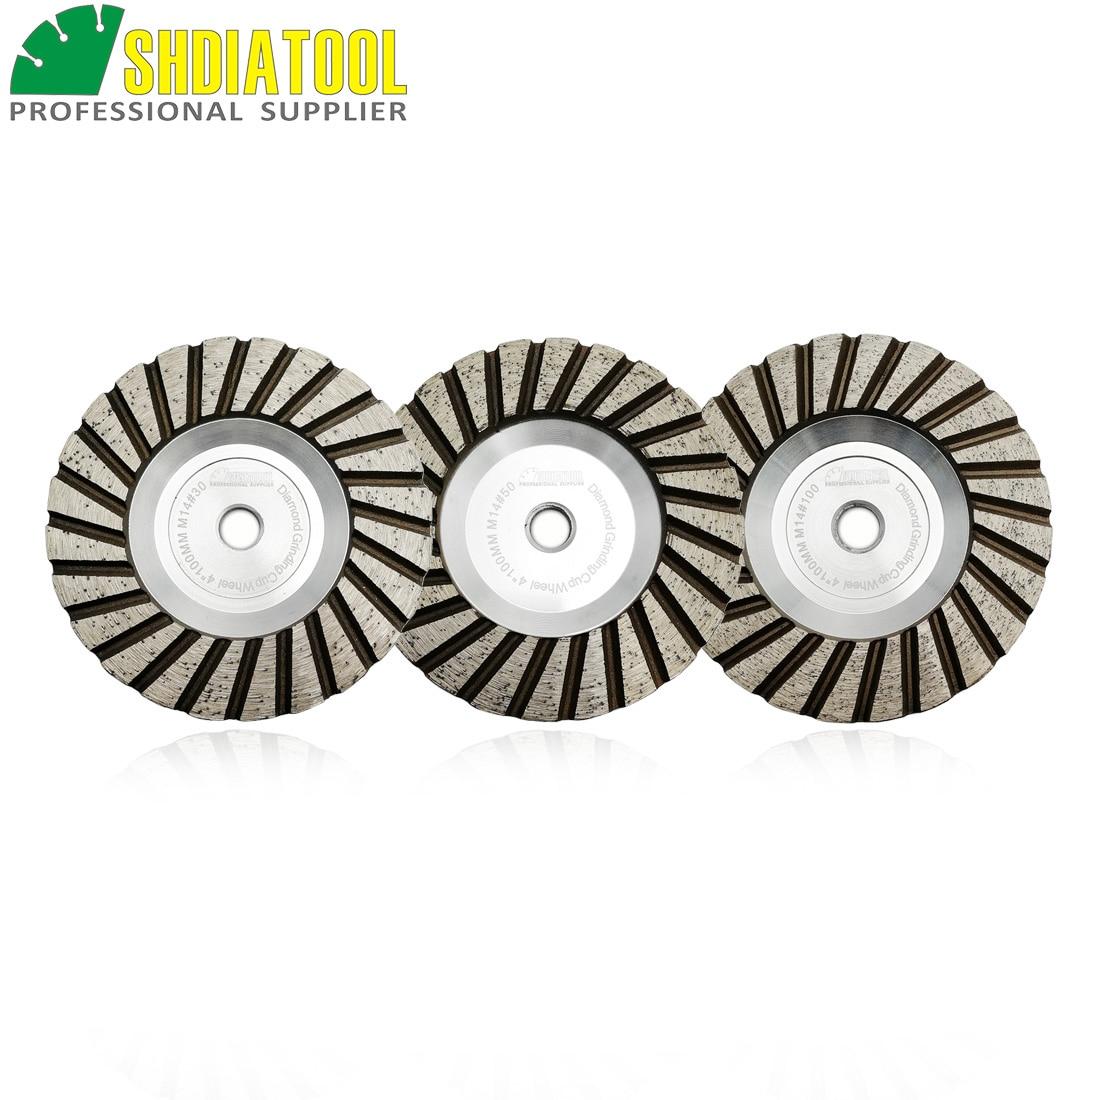 "SHDIATOOL 3pcs Dia 4""/100mm M14 Thread Aluminum Based Grinding Cup Wheel Grit #30+#50+#100 Granite Marble Grinding Wheel"